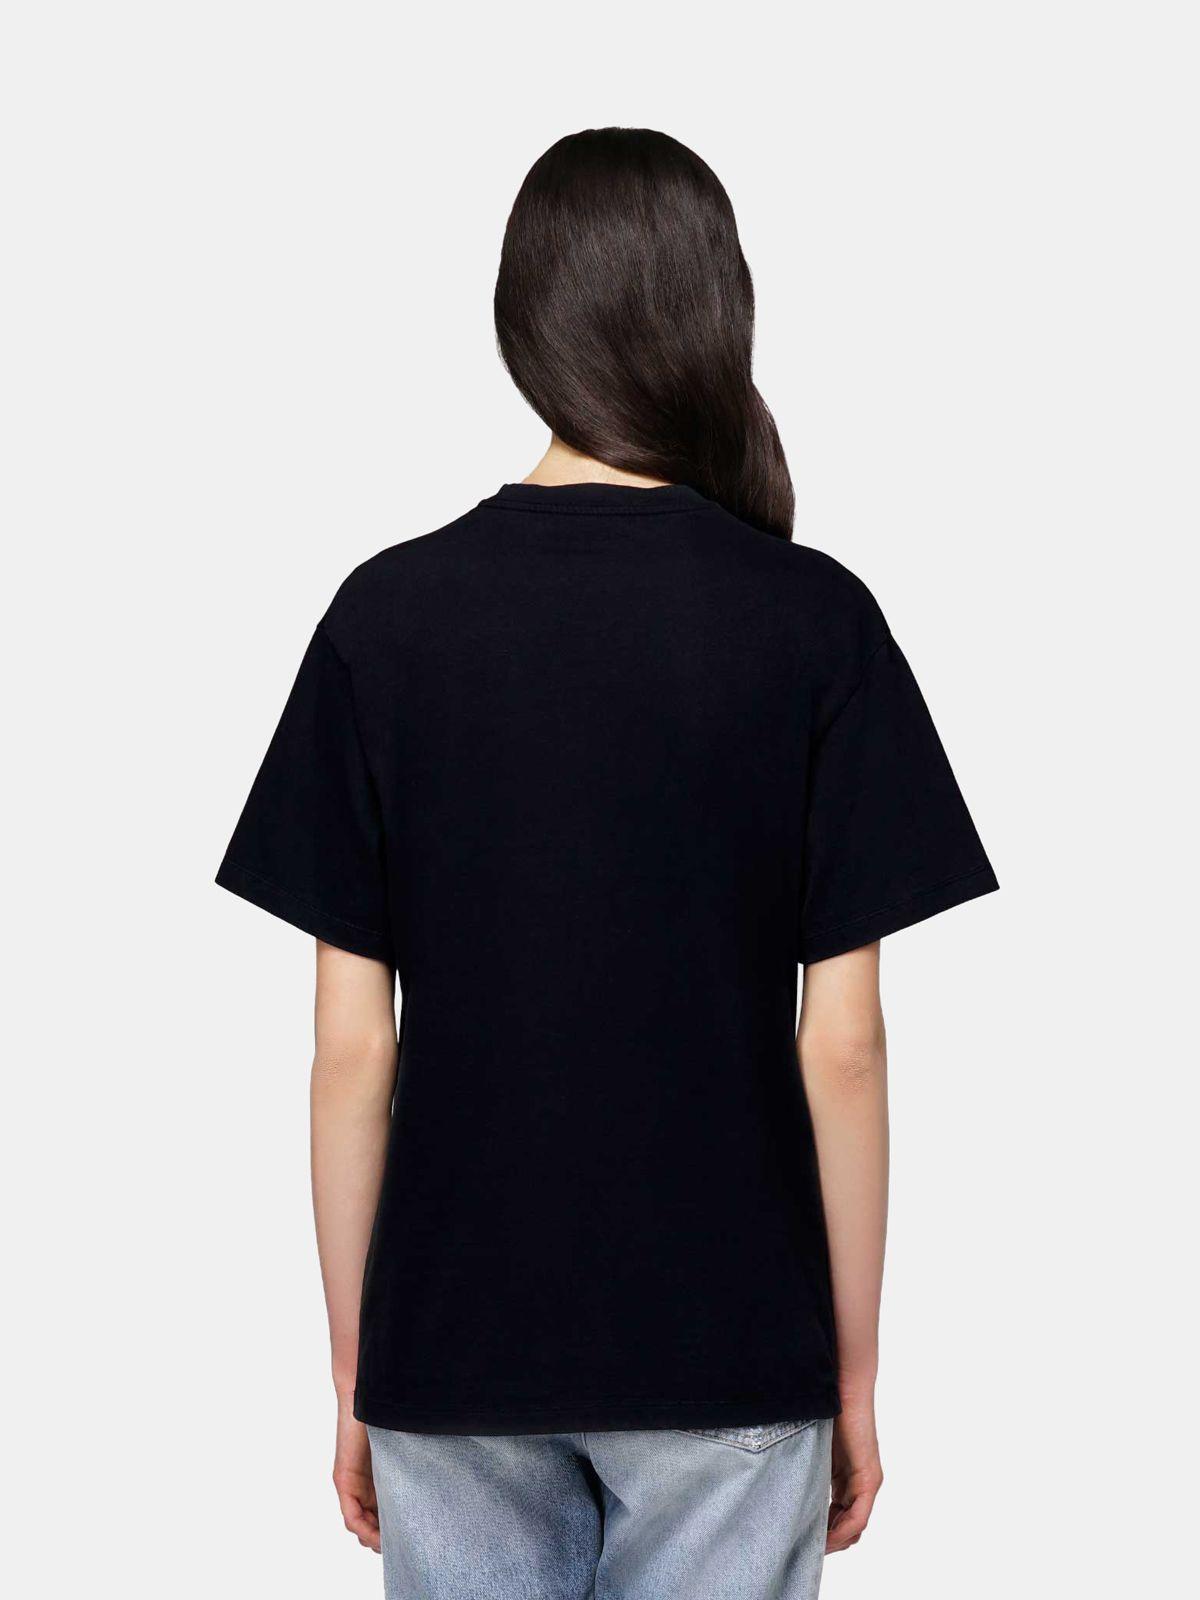 Golden Goose - Black Golden T-shirt with flag print in